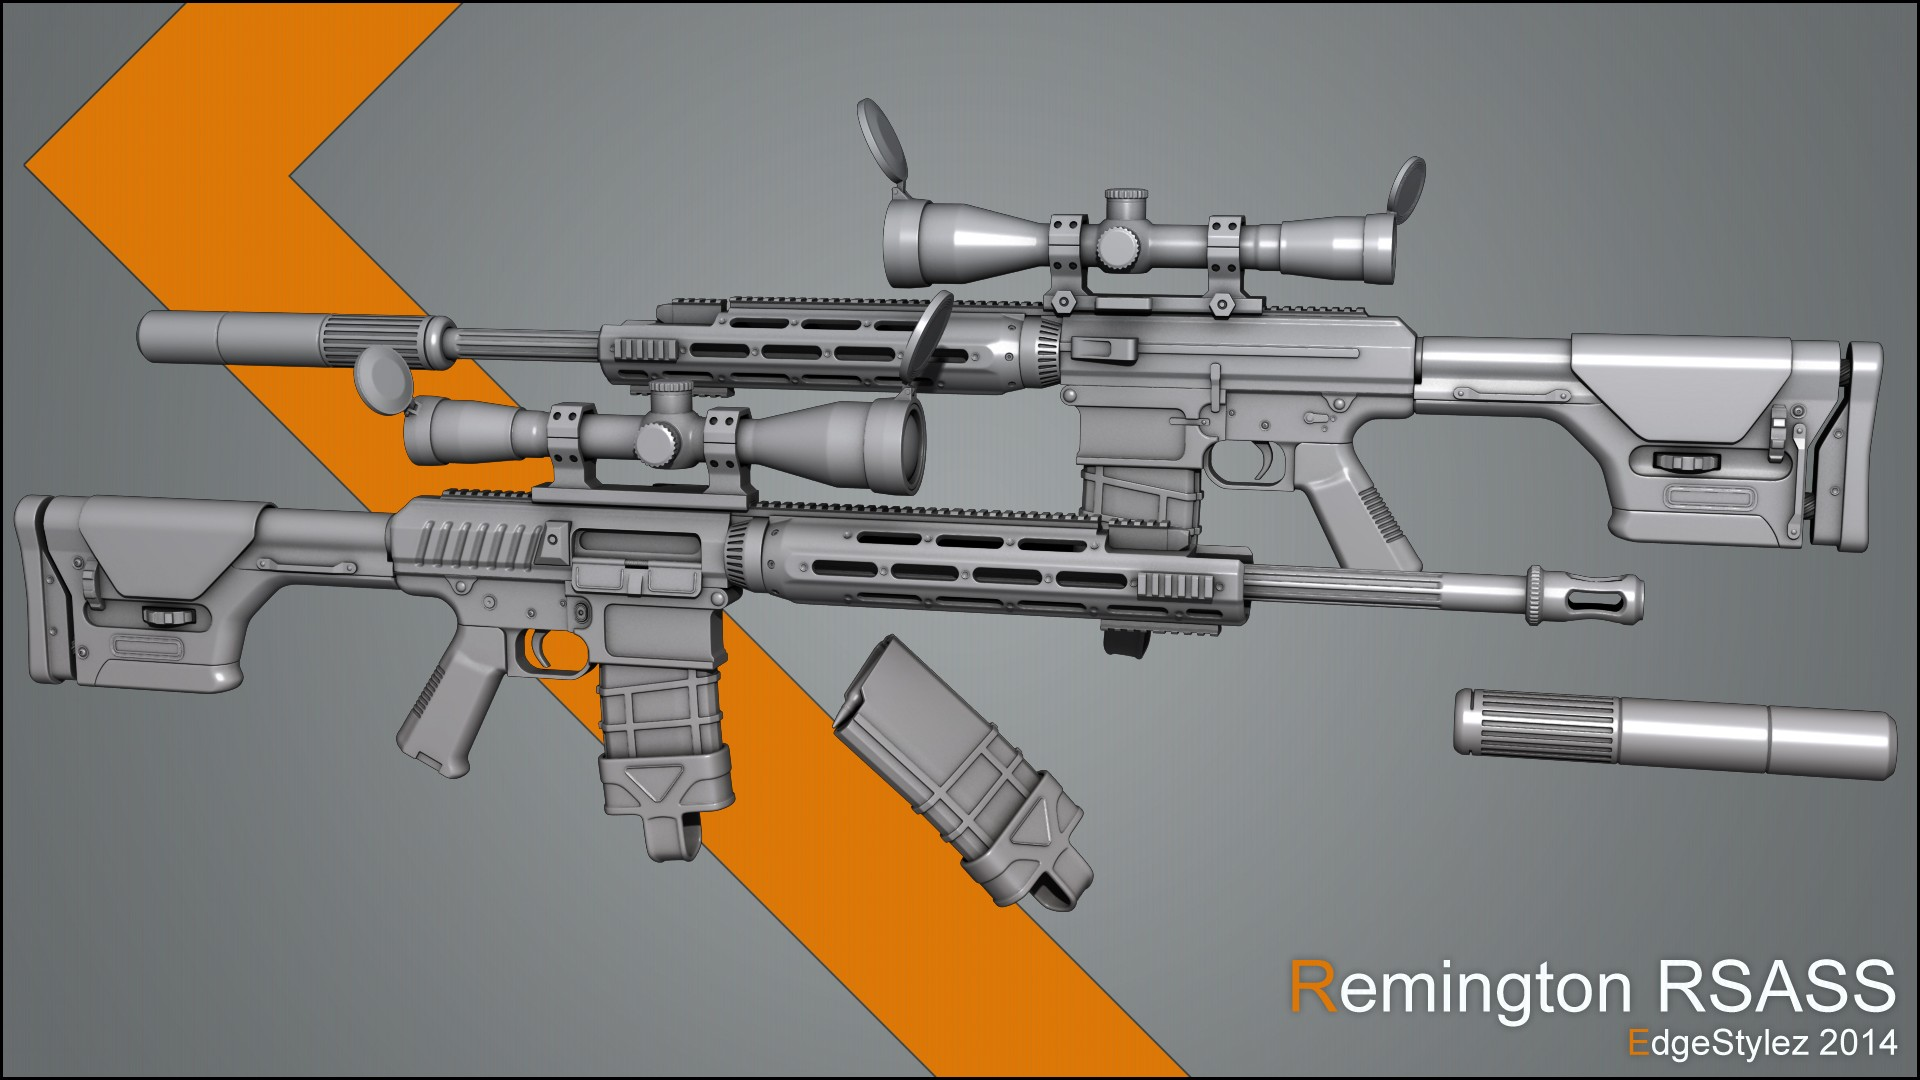 Remington RSASS [GameBanana] [Works In Progress]